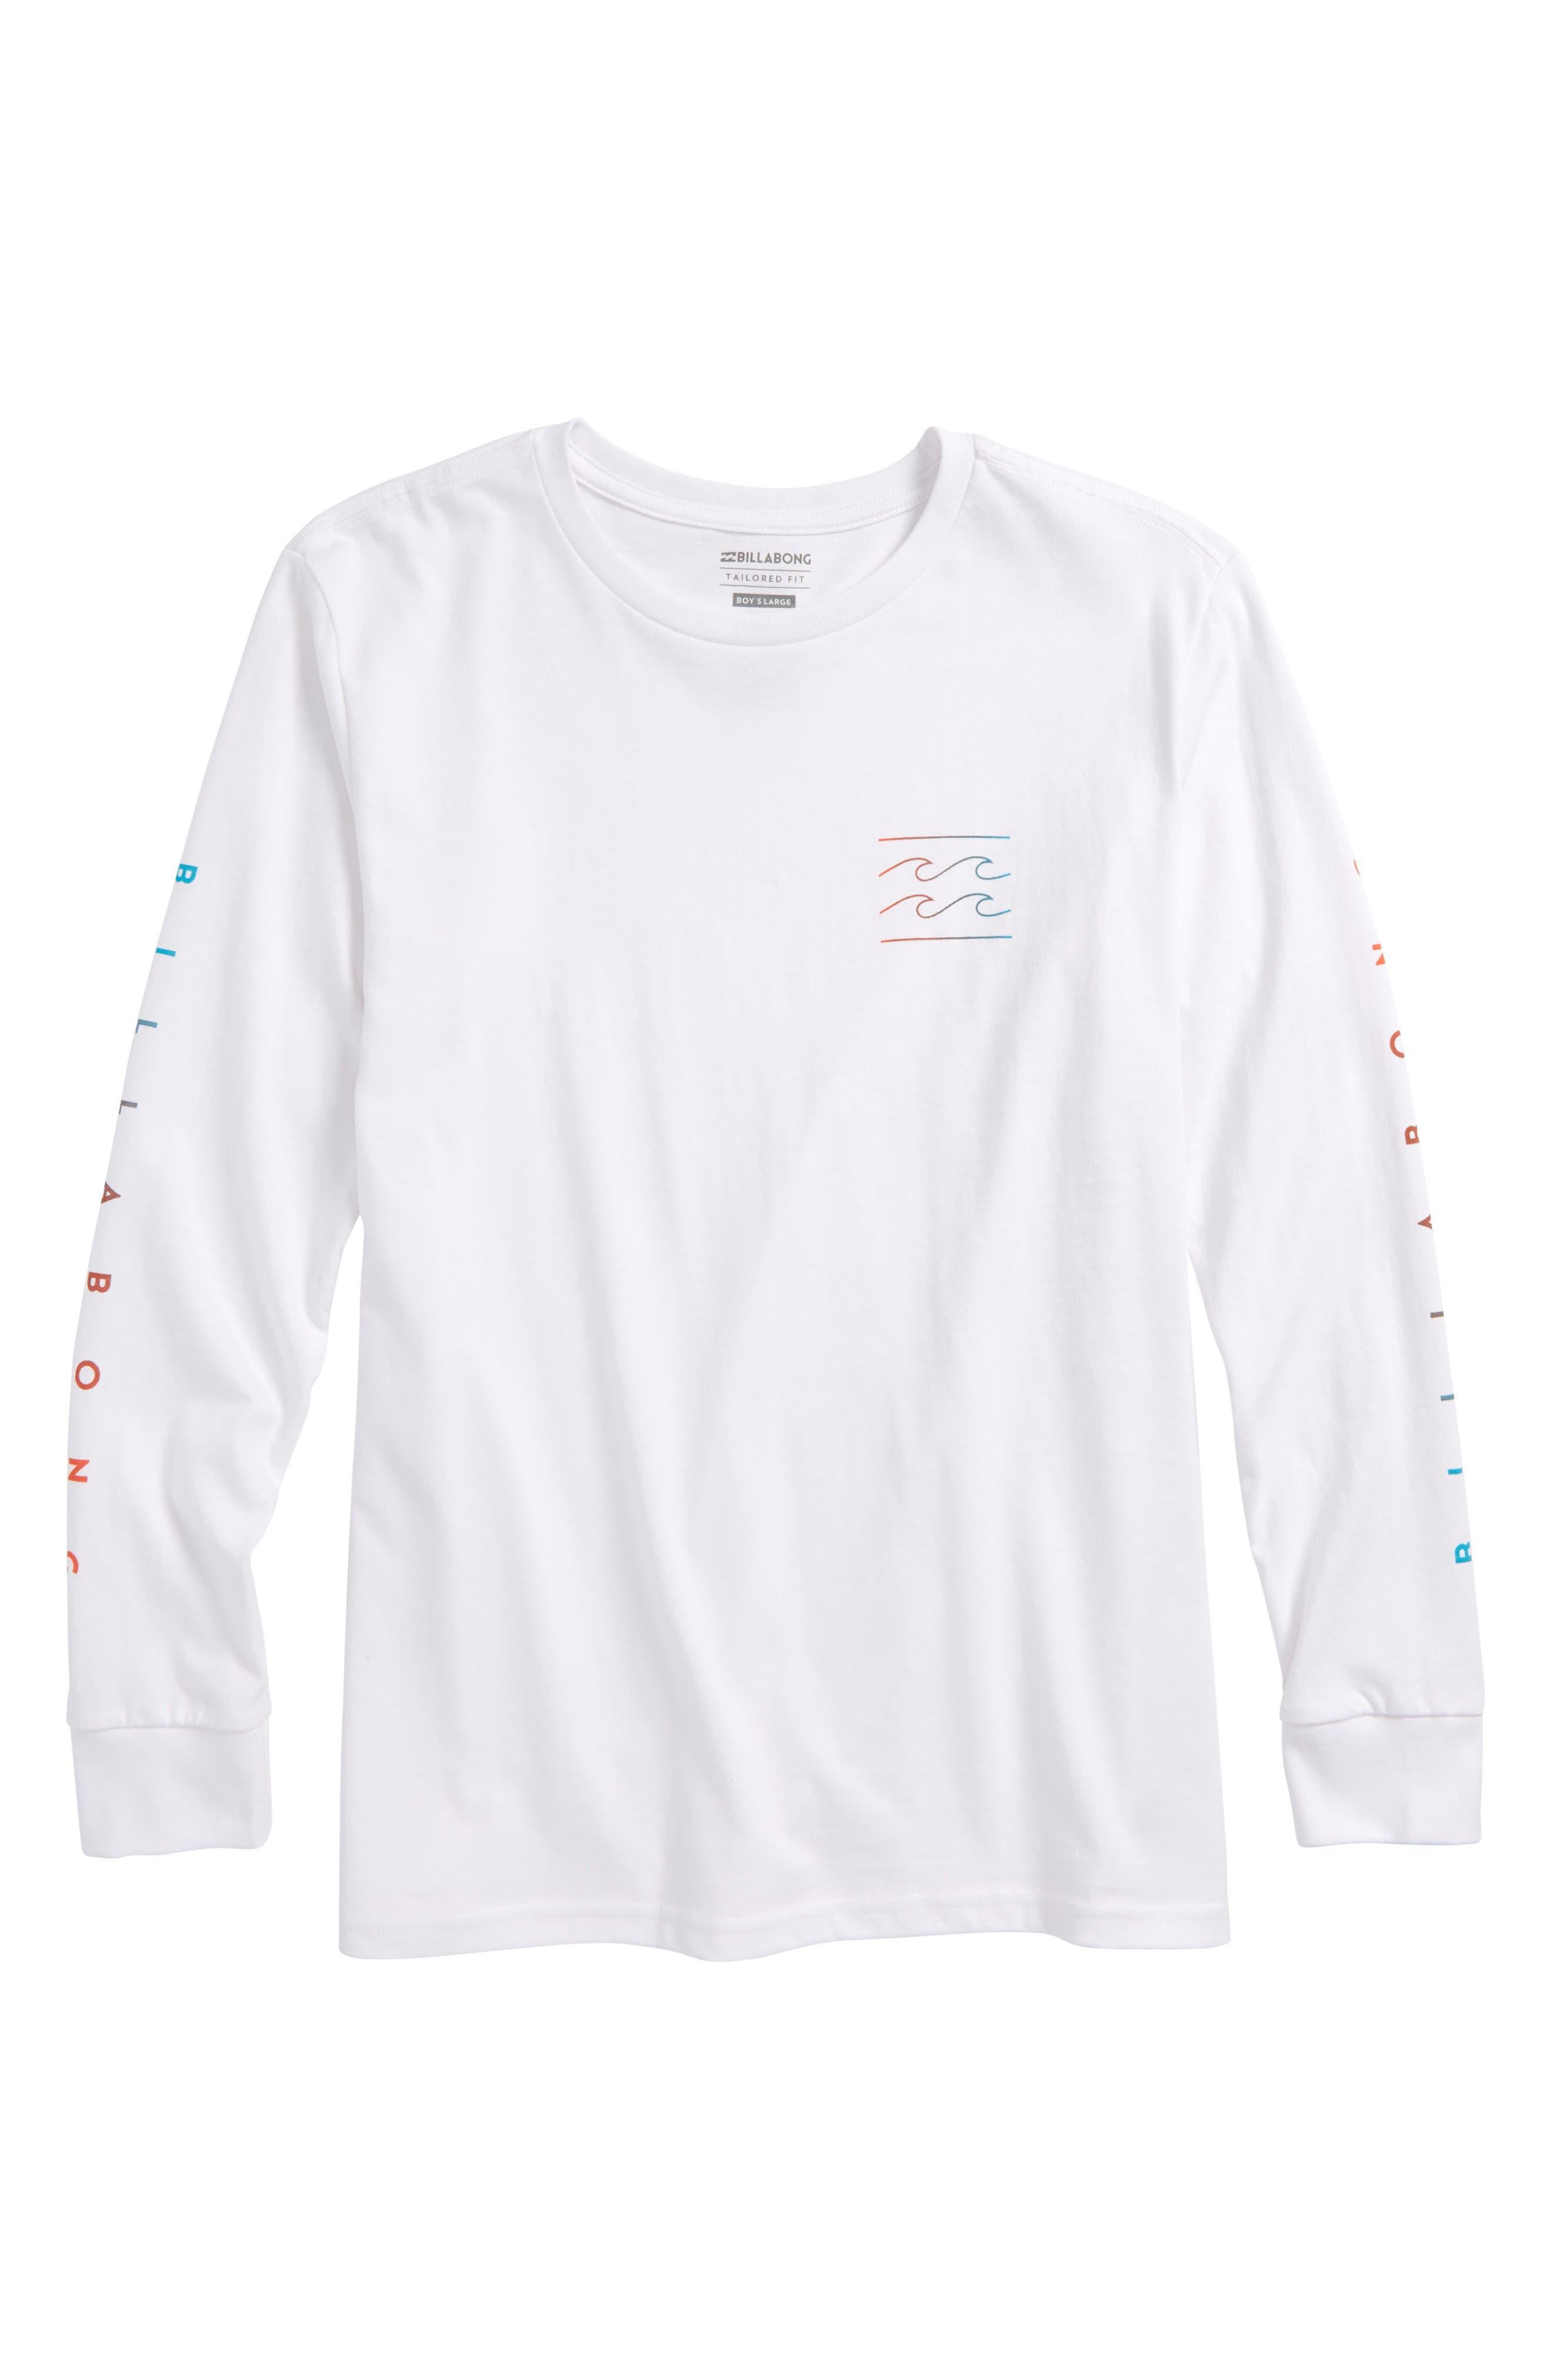 Unity T-Shirt,                         Main,                         color, White